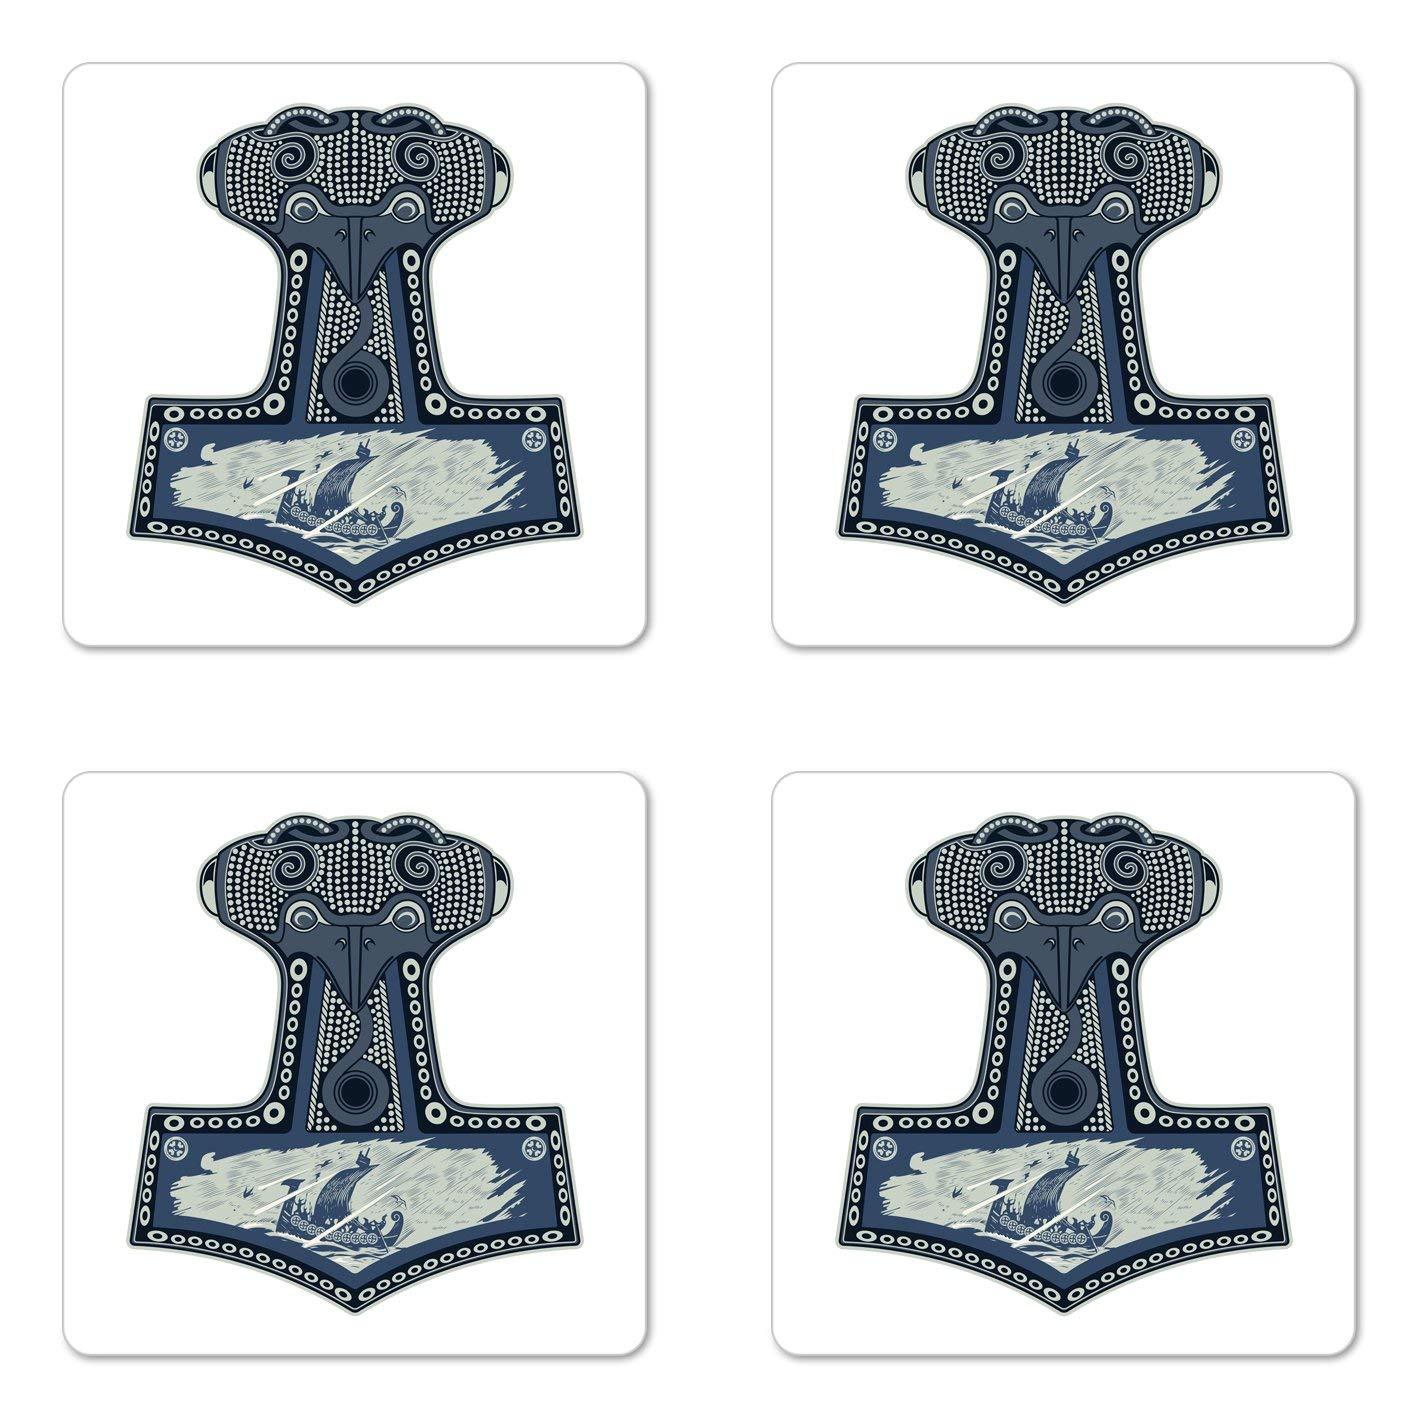 Lunarable Viking Coaster Set of Four, Scandinavian Folklore Motifs Northern Germanic Culture Mjollnir, Square Hardboard Gloss Coasters for Drinks, Blue Grey Navy Blue Slate Blue